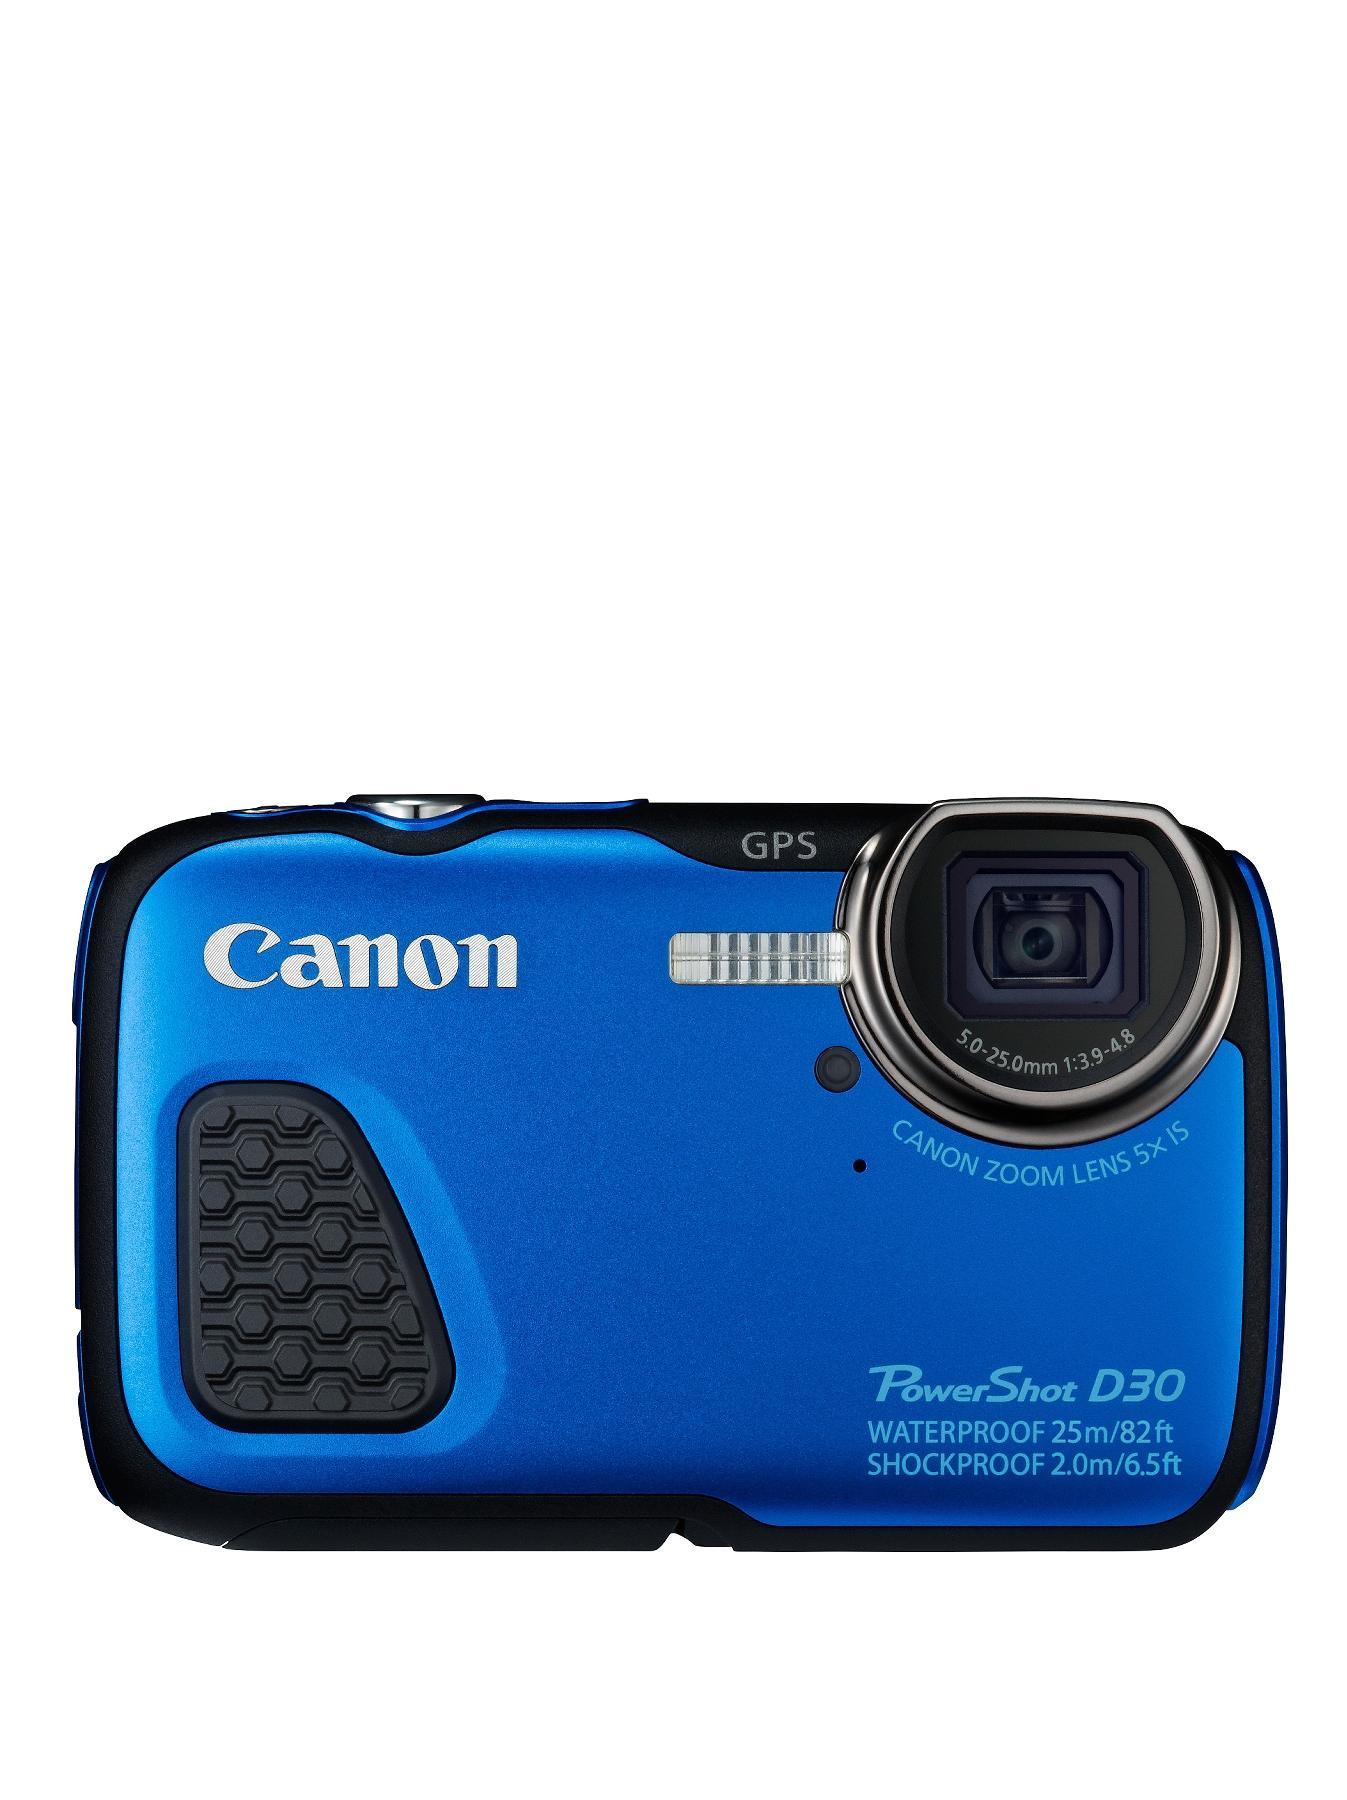 Canon D30 PowerShot 12 Megapixel Waterproof Digital Camera - Blue